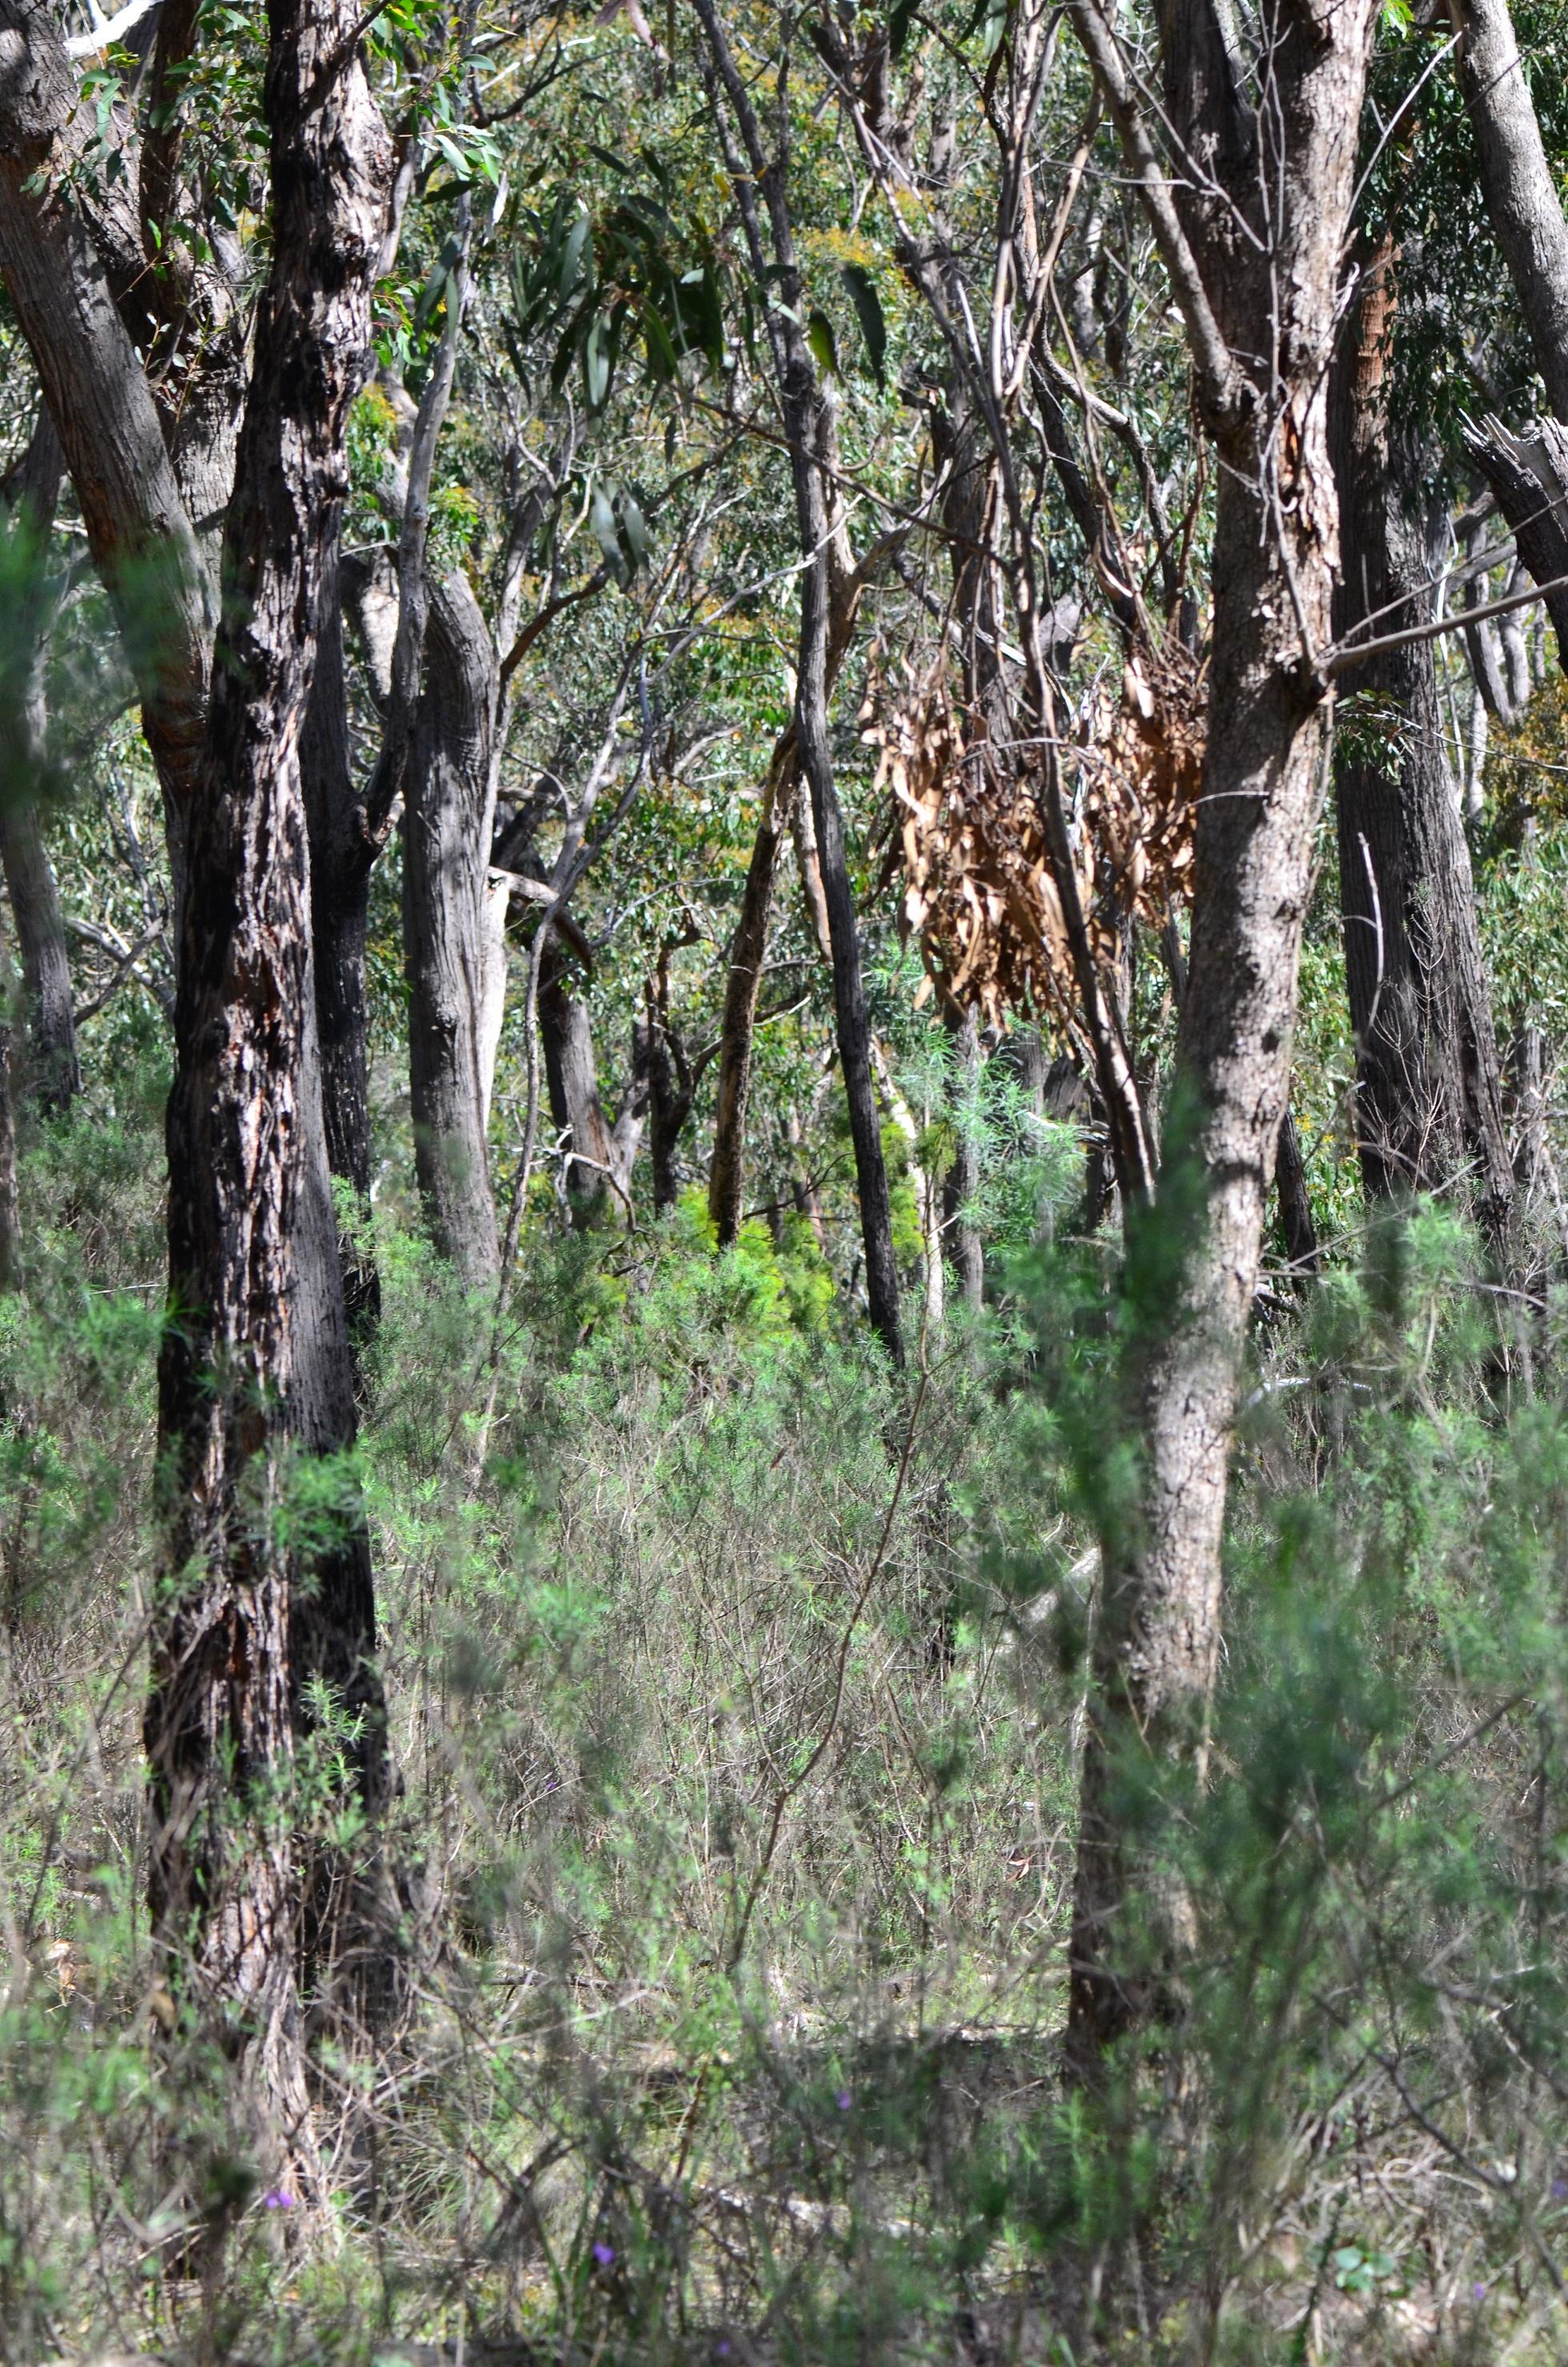 Dense dry forest at Fourth Hill, Warrandyte. Image: Sarah Bond